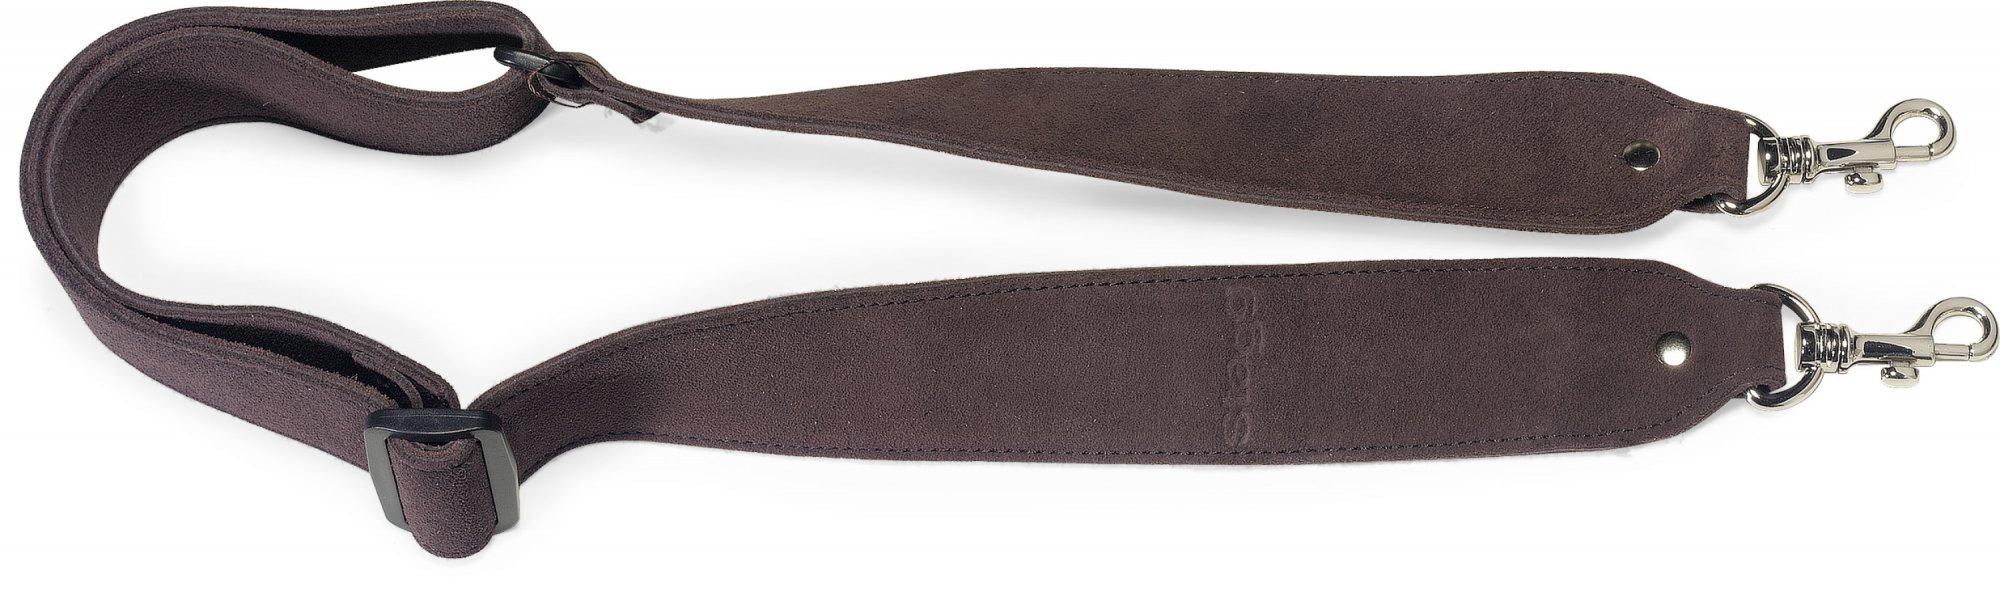 Stagg Suede Banjo Strap - Dark Brown